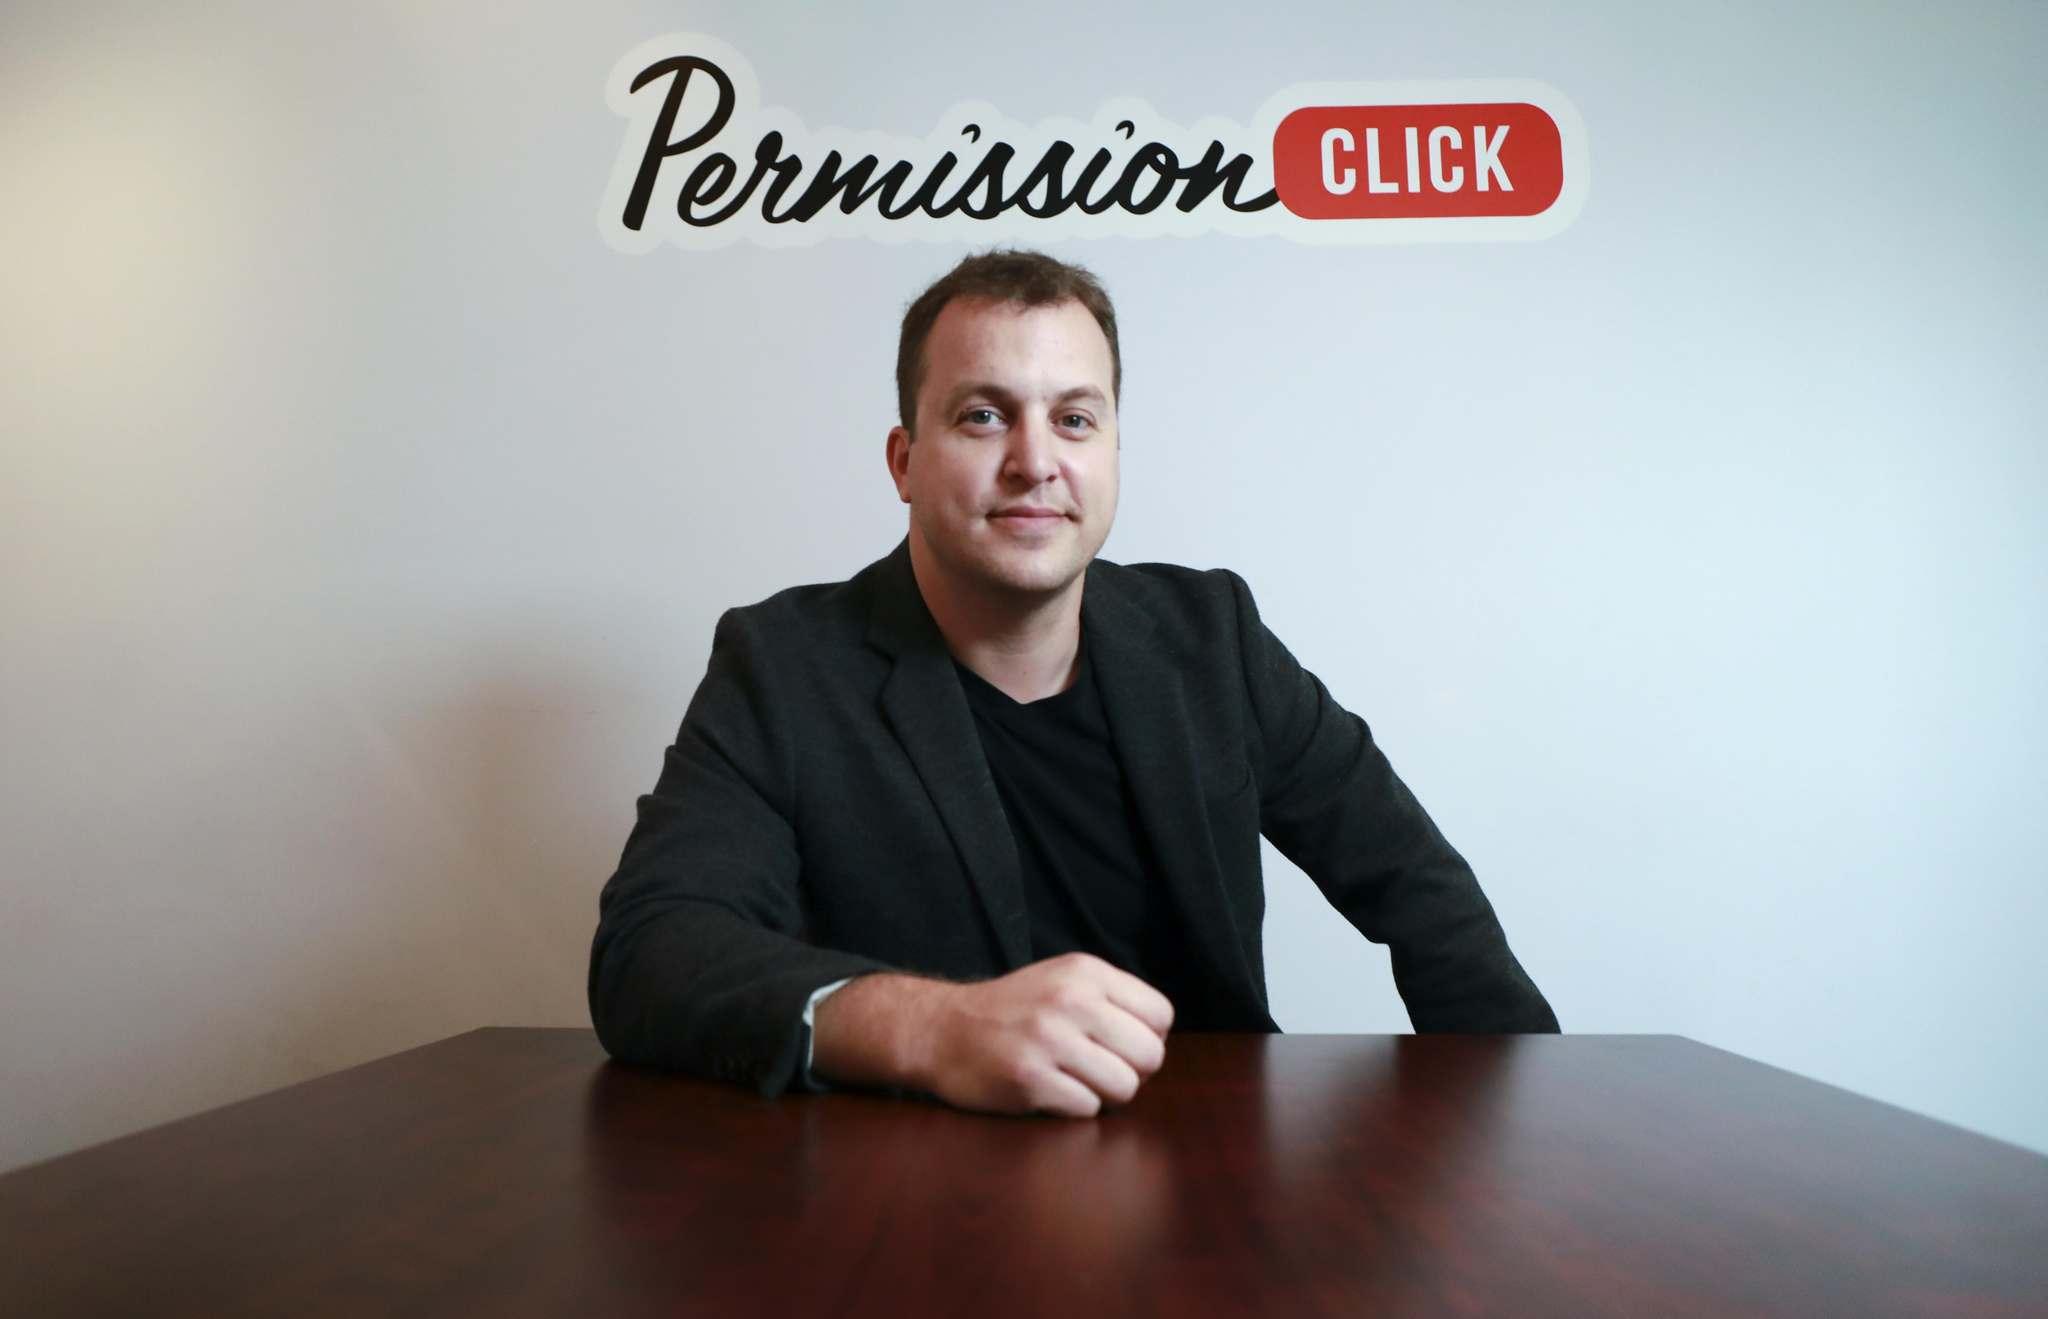 Photo of Chris Johnson, CEO of Permission Click